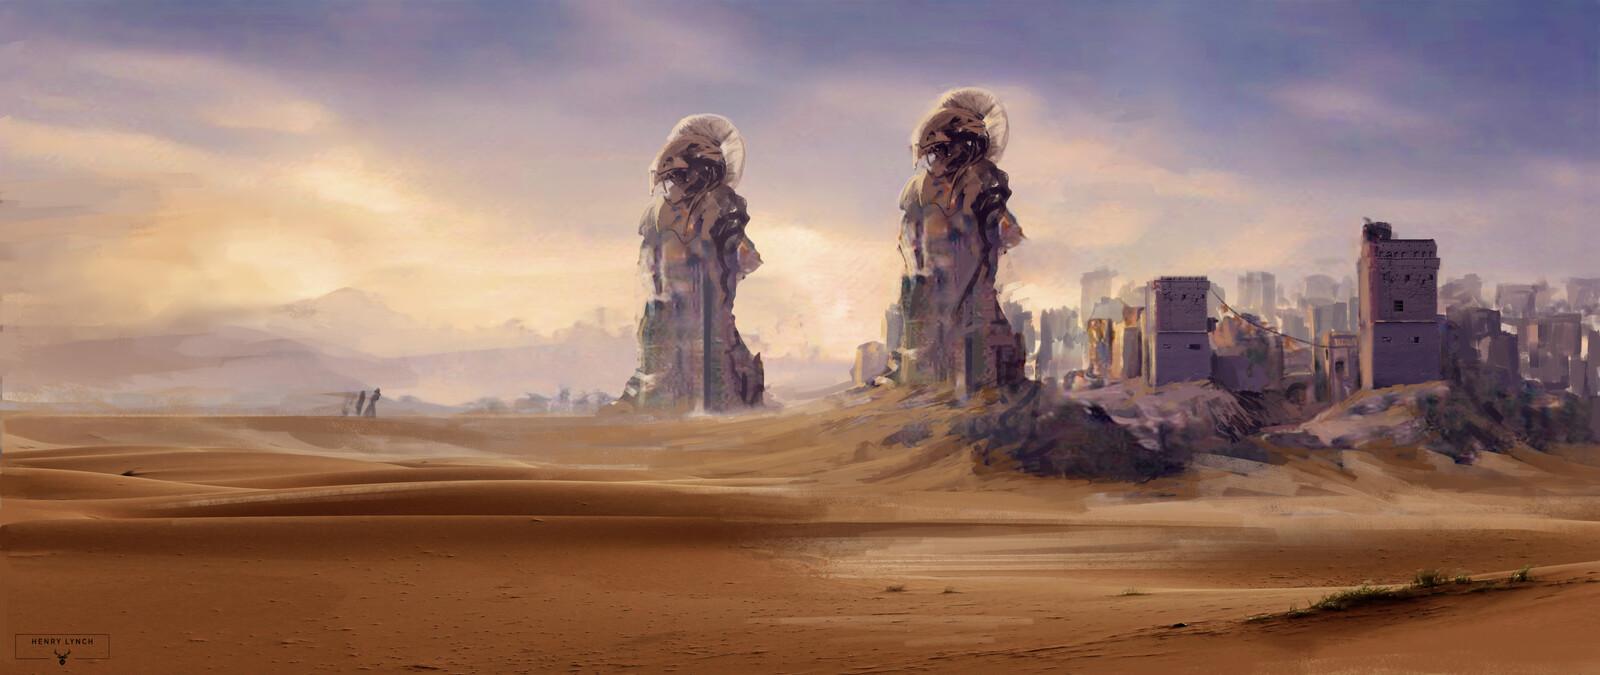 Desert City Concept (Entrance)